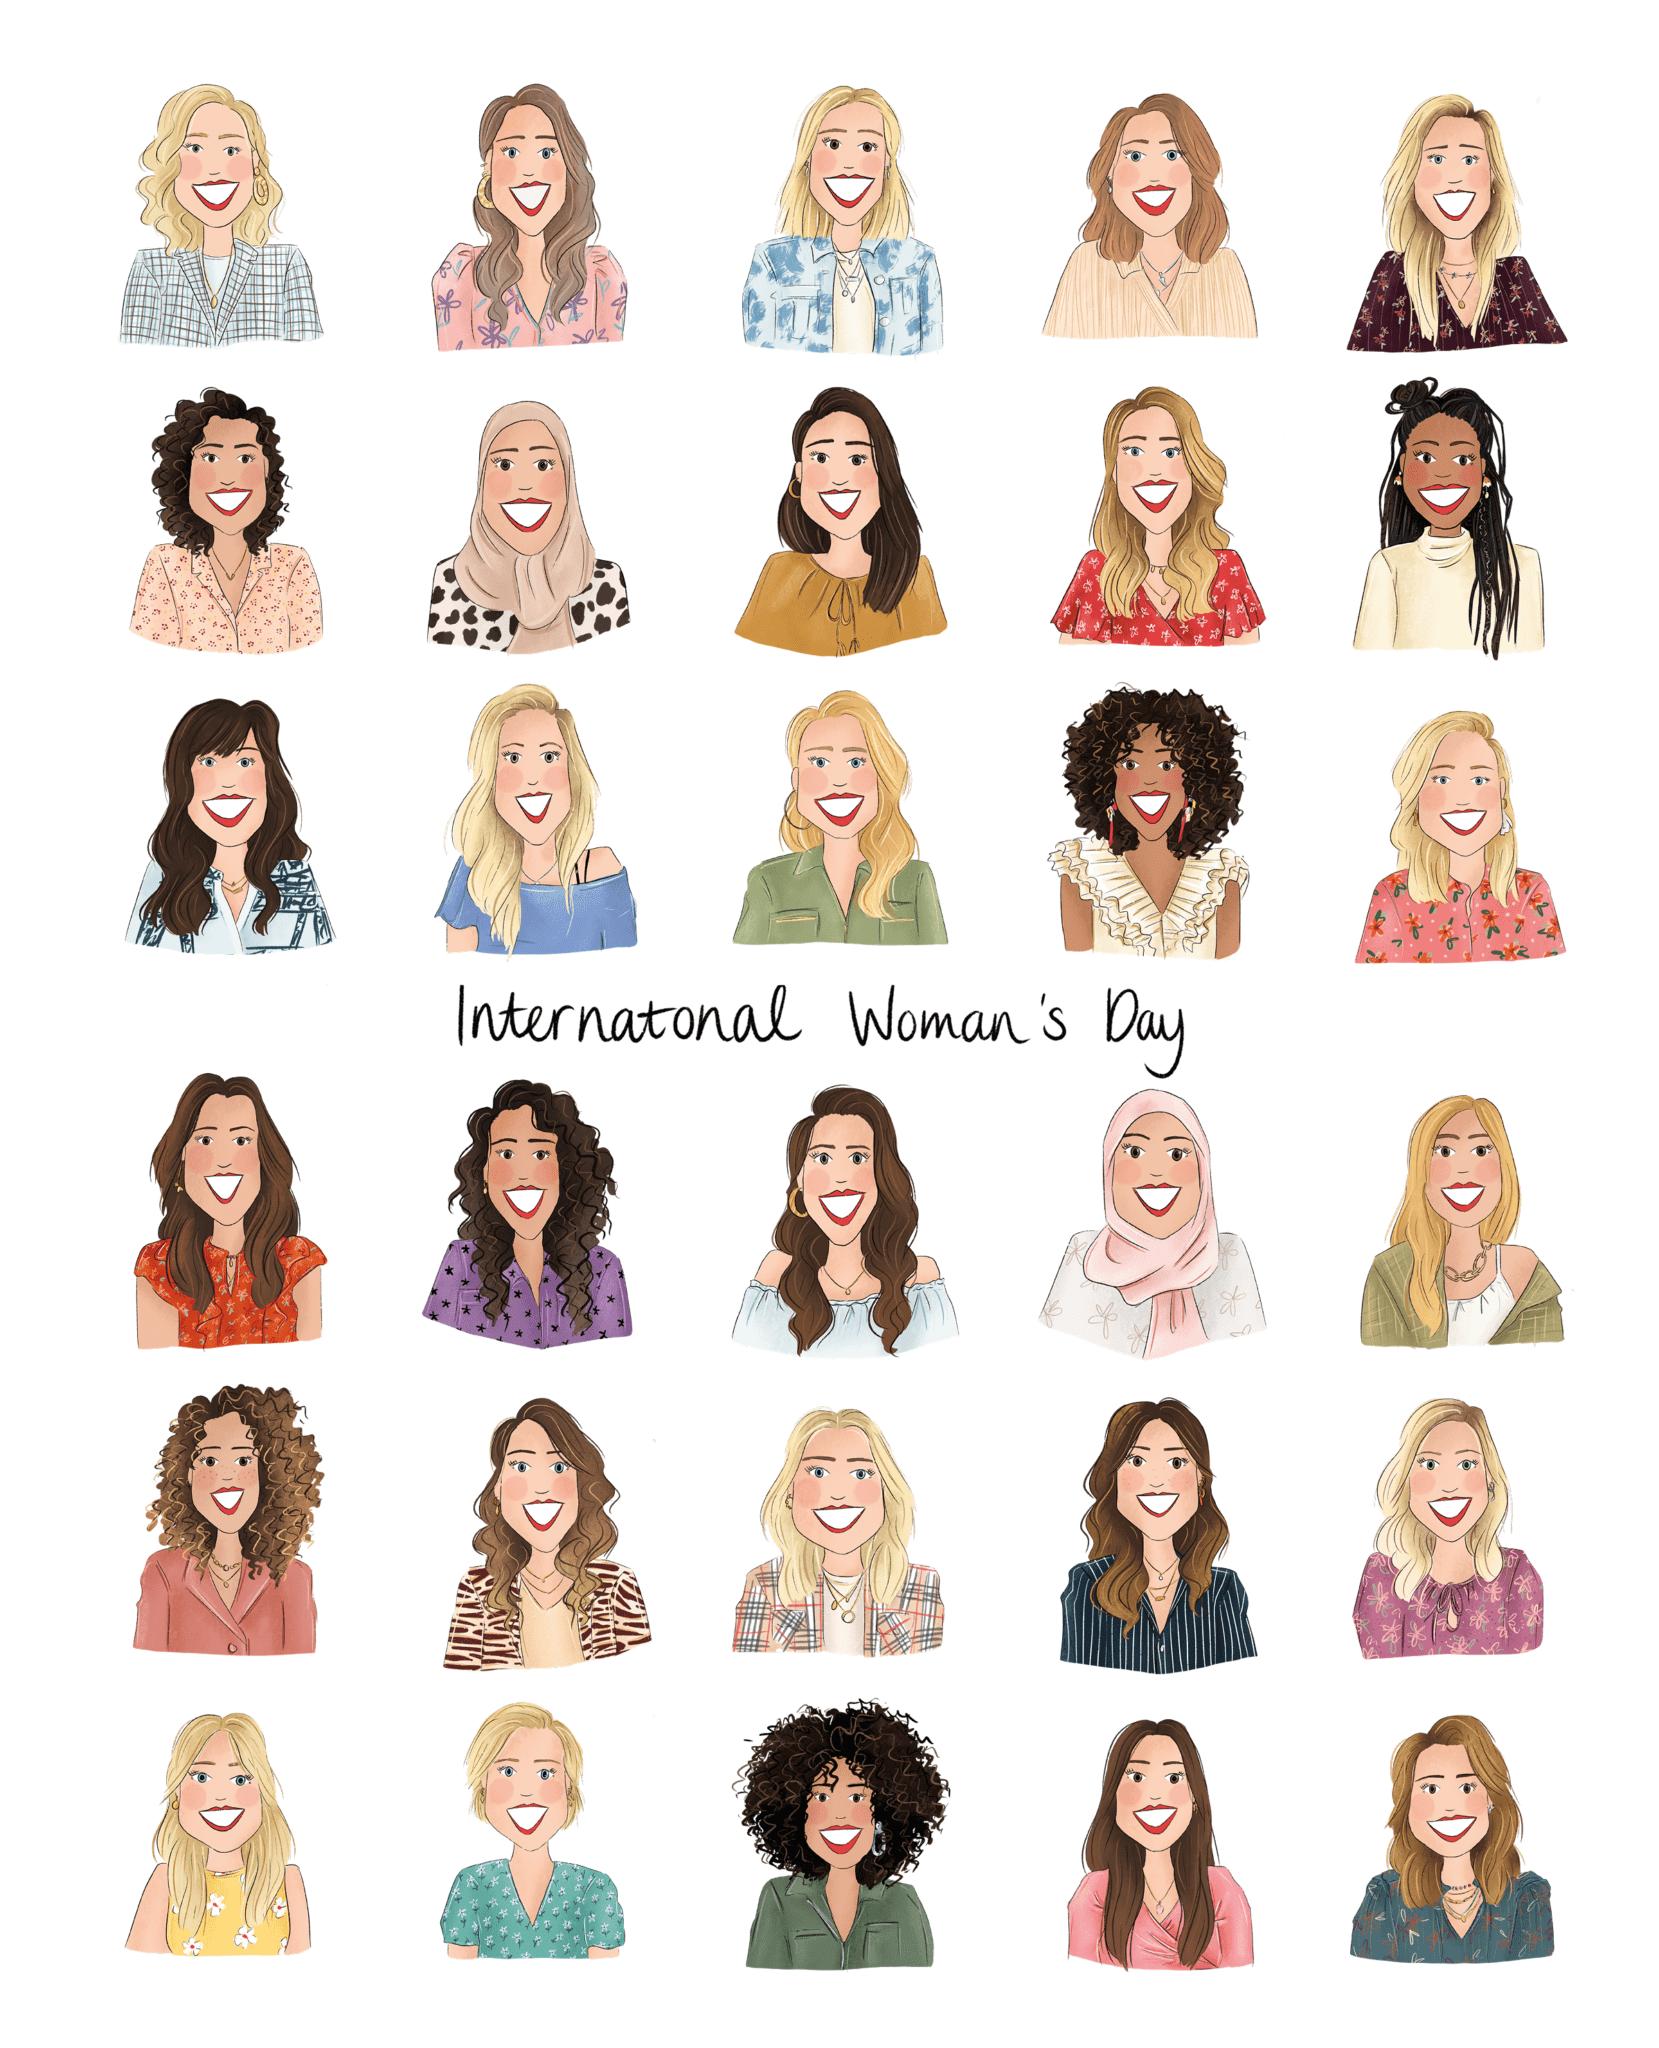 Je bekijkt nu International Women's Day!